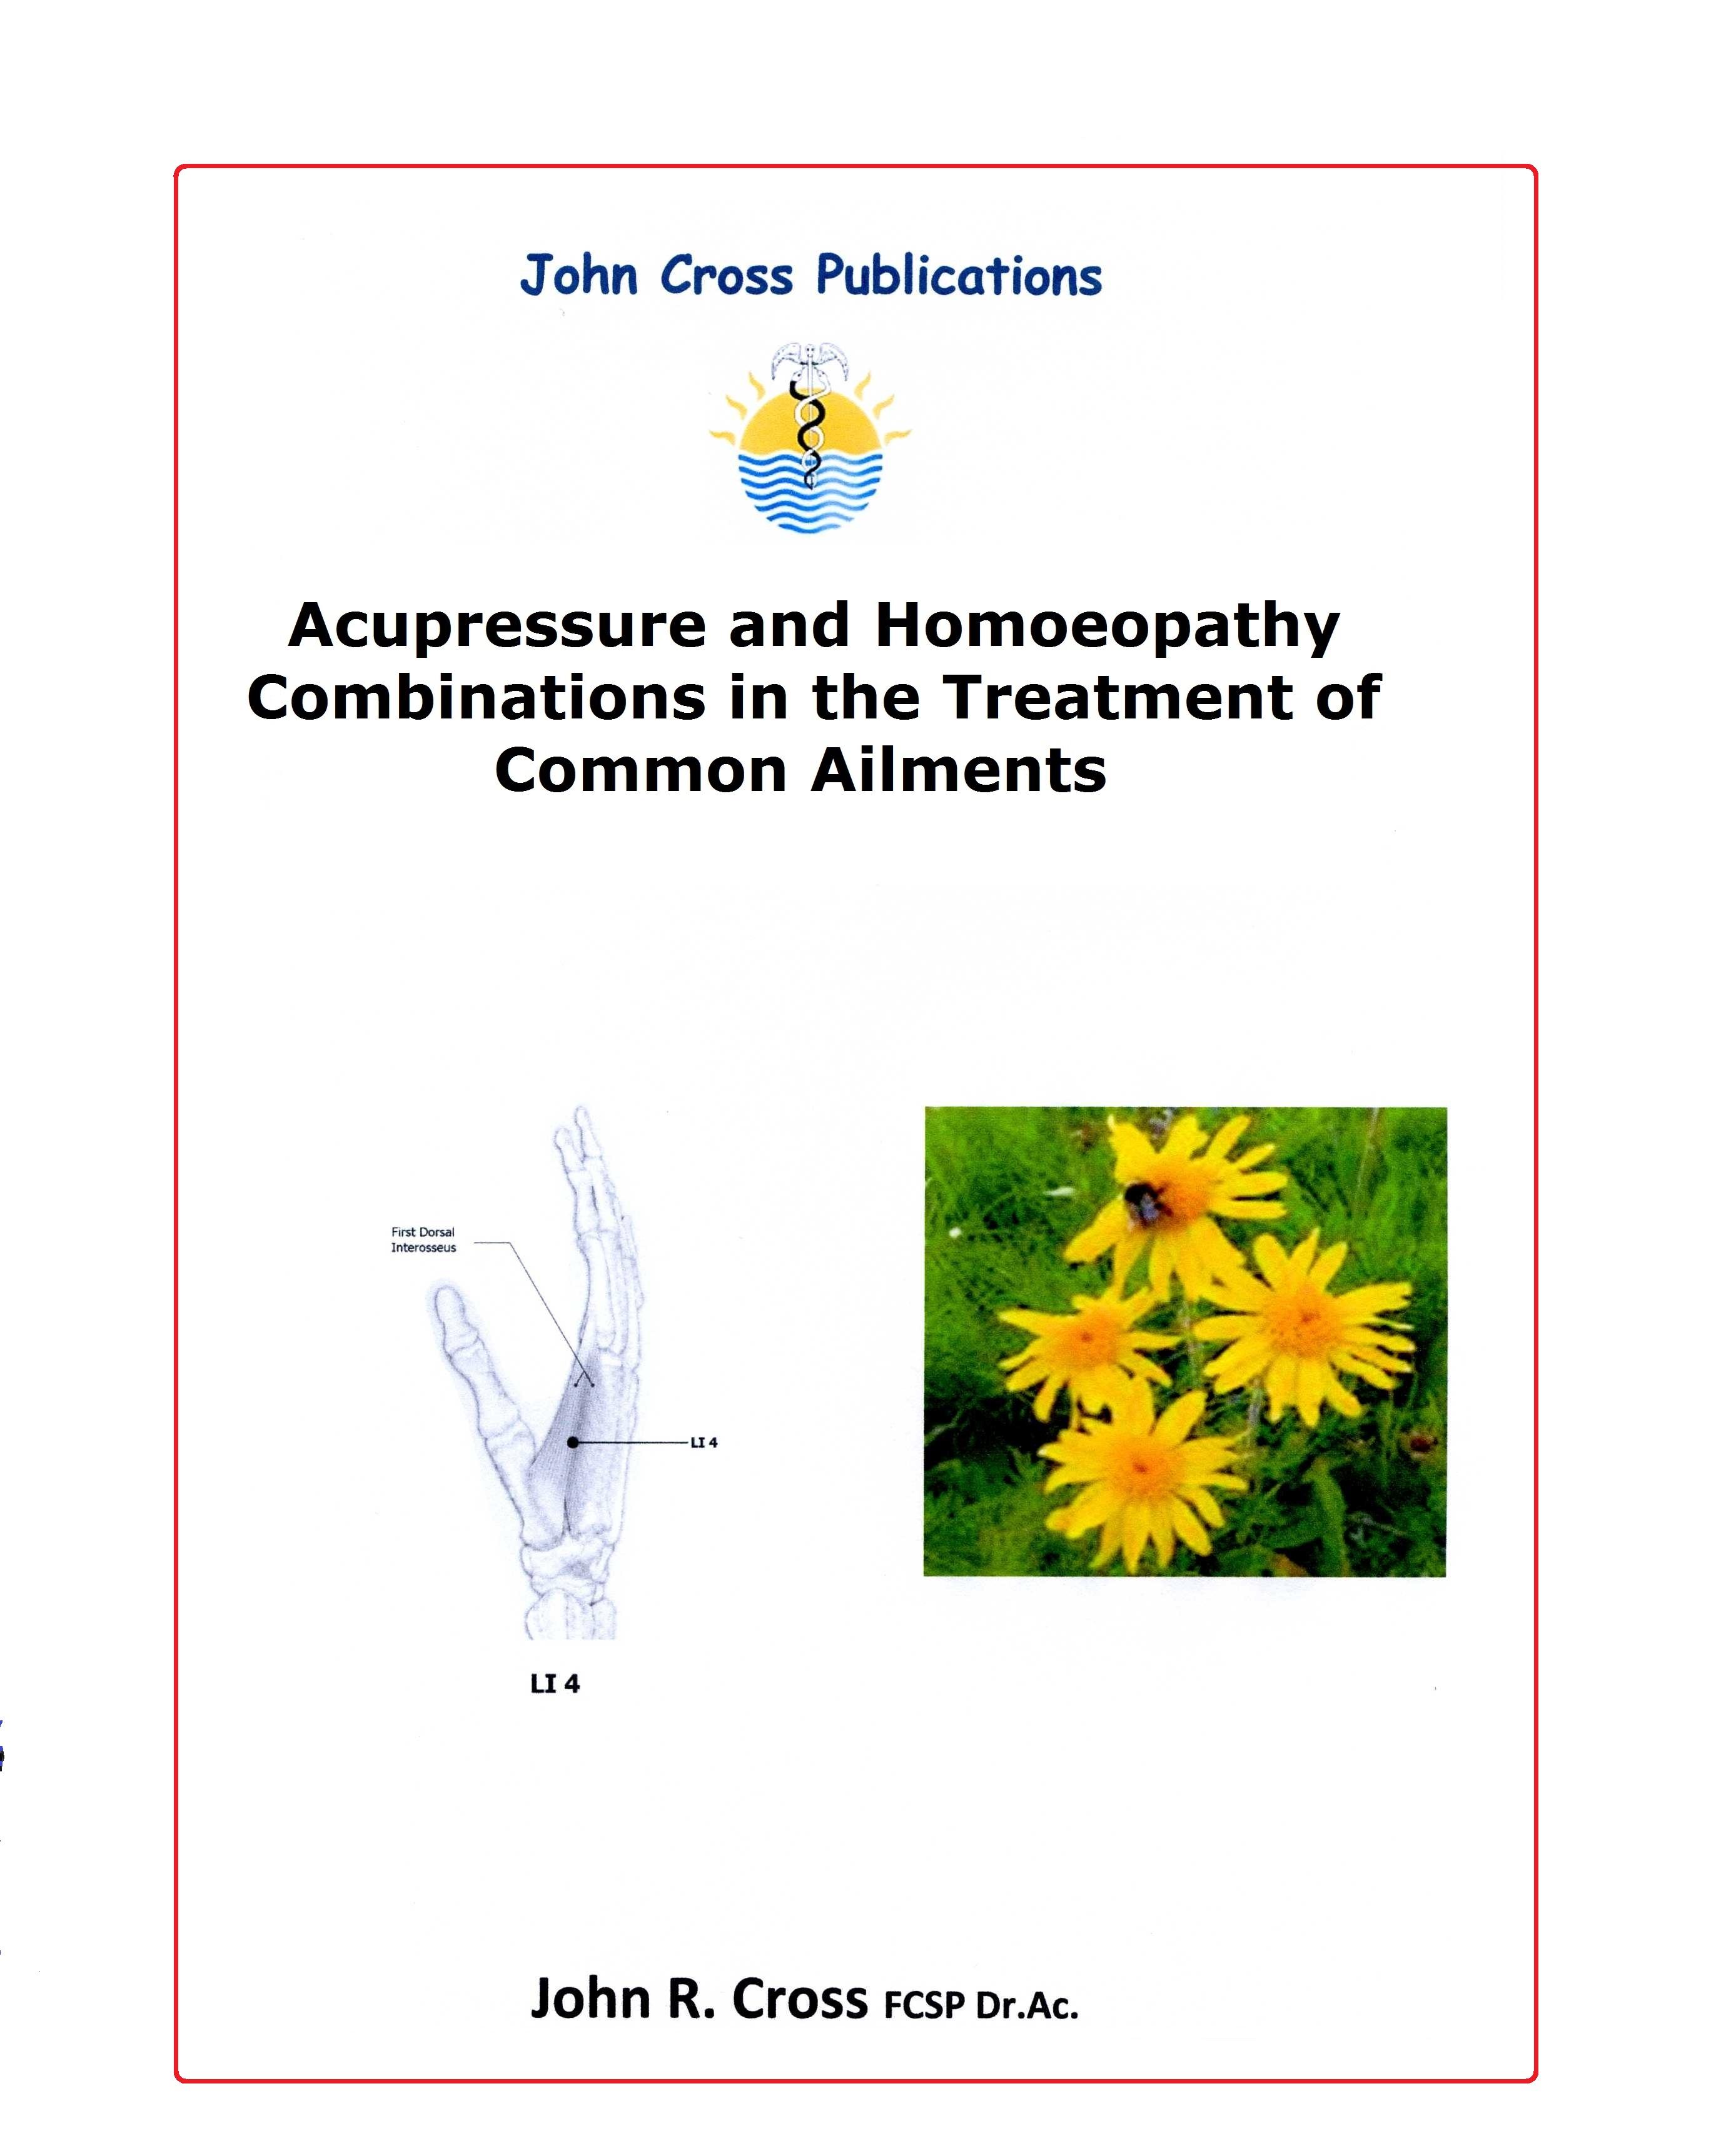 PDF Downloads – John Cross Publications